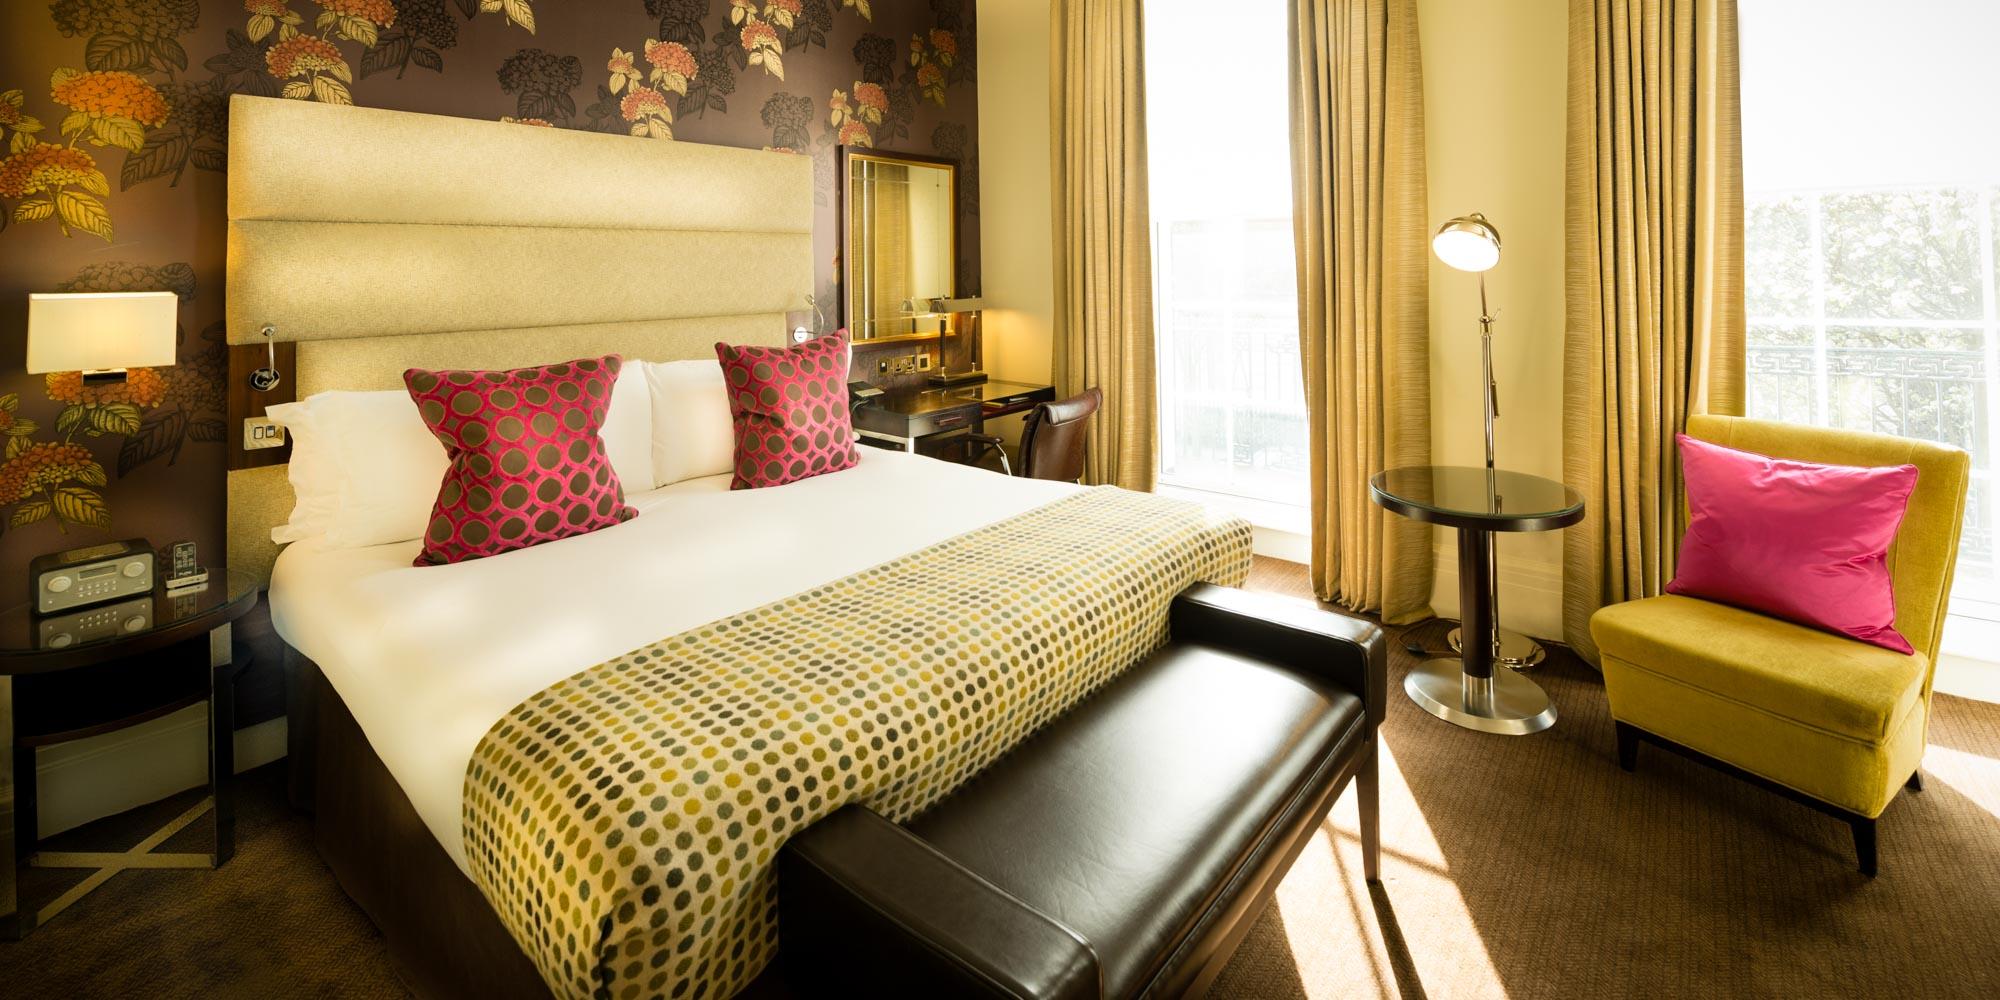 Hotel Interiors Photographers London UK